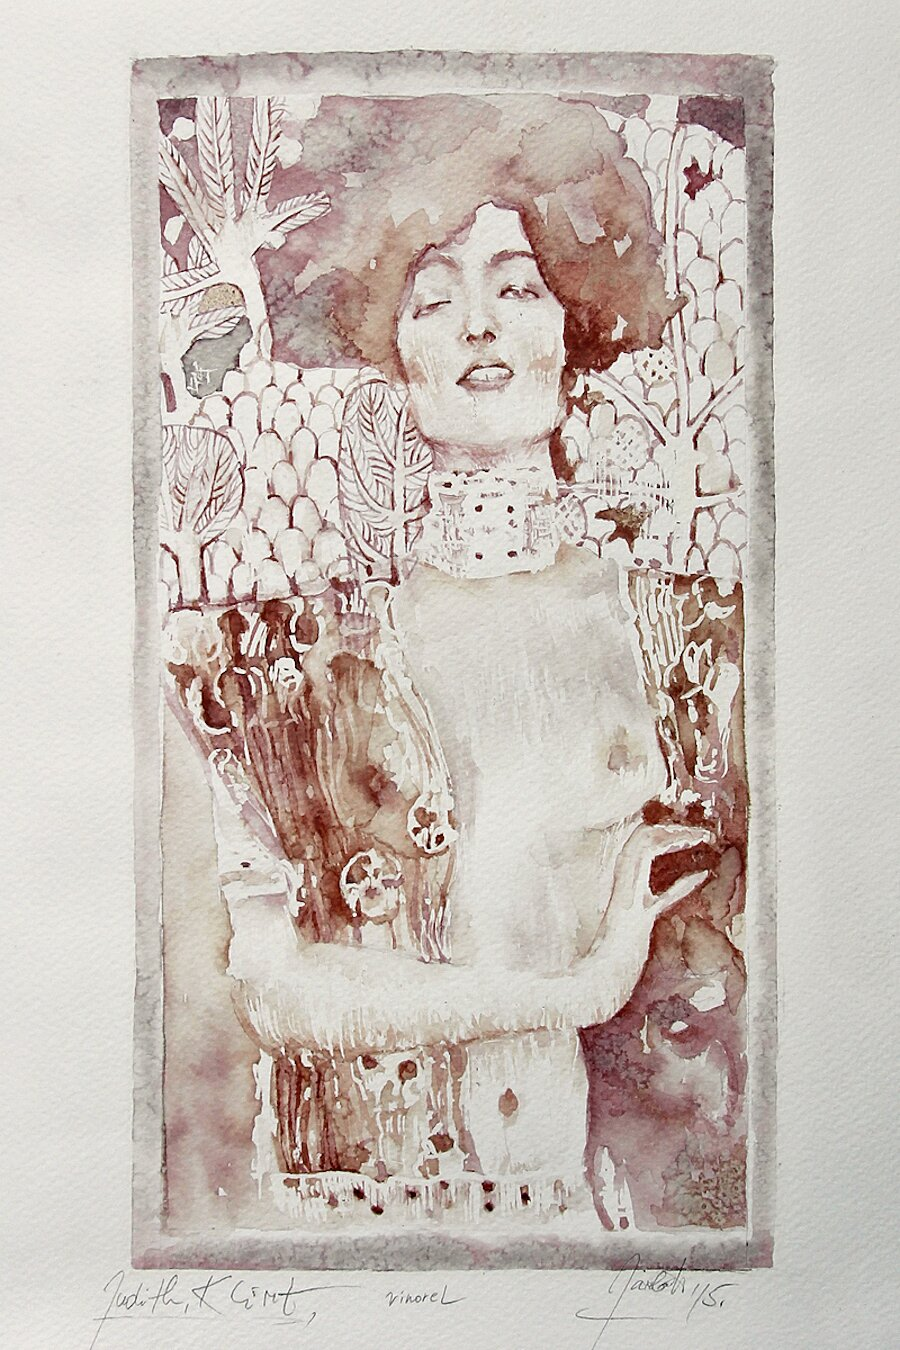 dipinti-acquerelli-vino-rosso-winerelle-sanja-jankovic-06